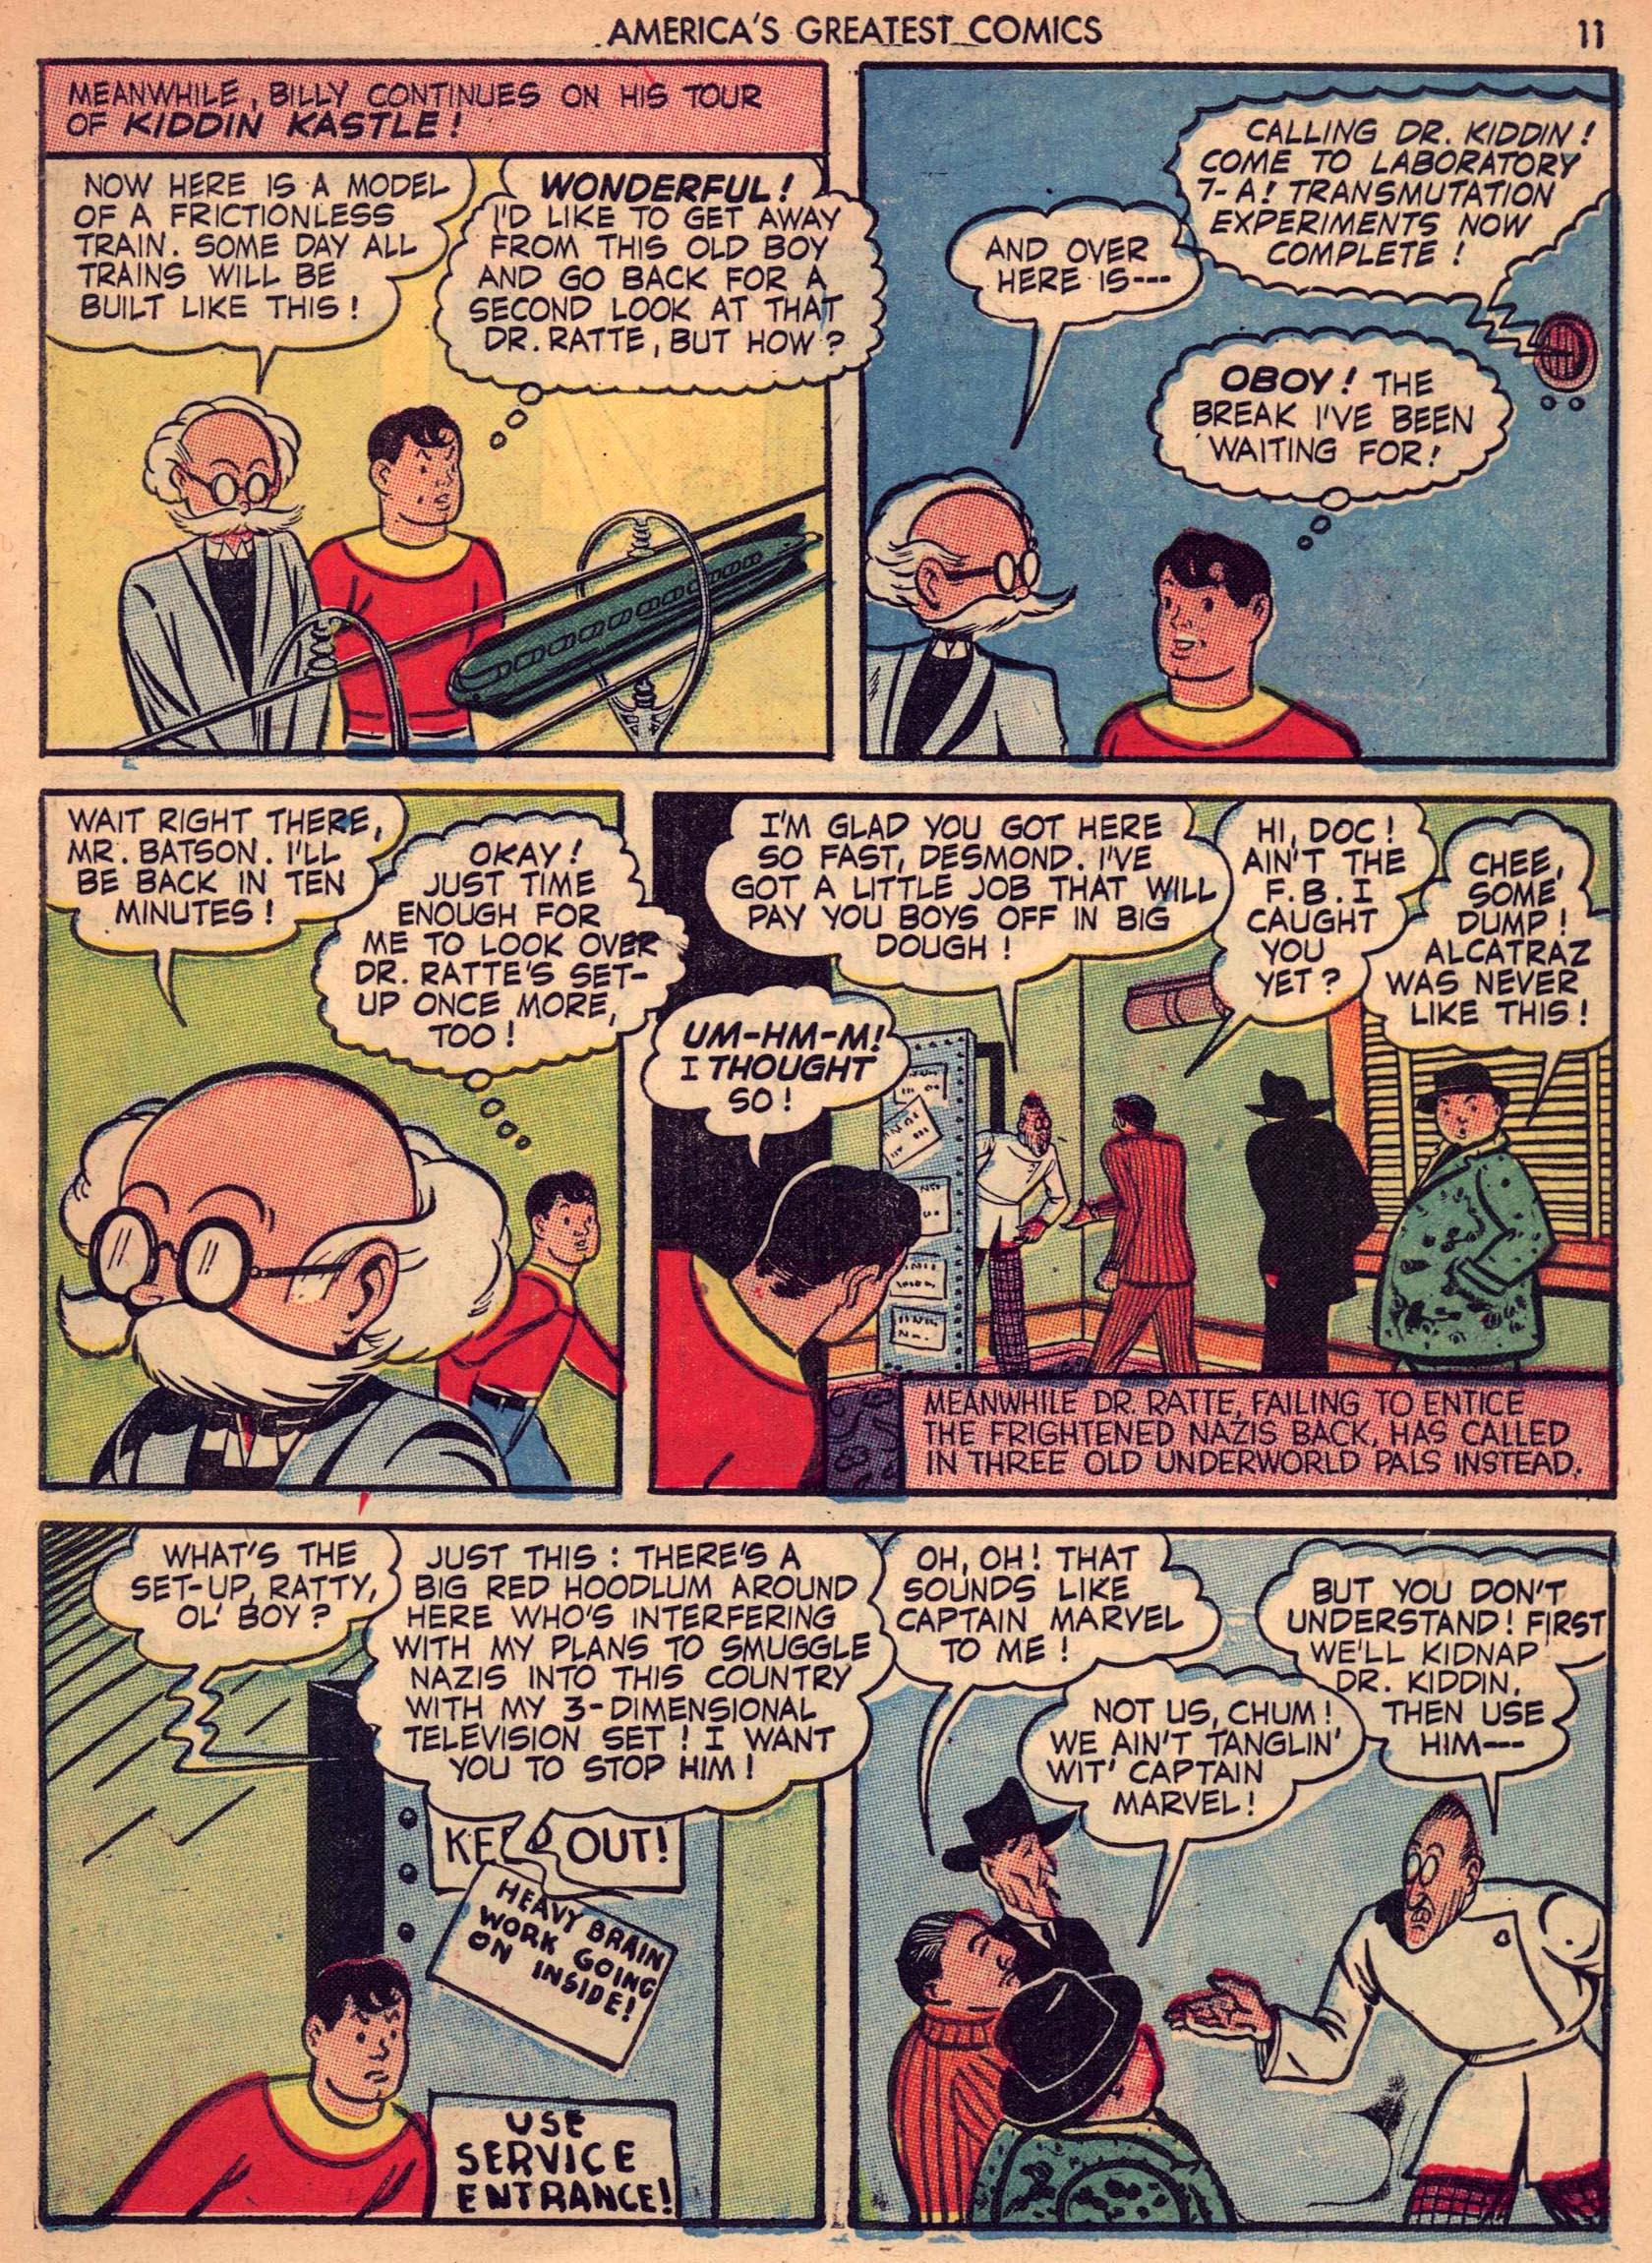 Read online America's Greatest Comics comic -  Issue #7 - 10